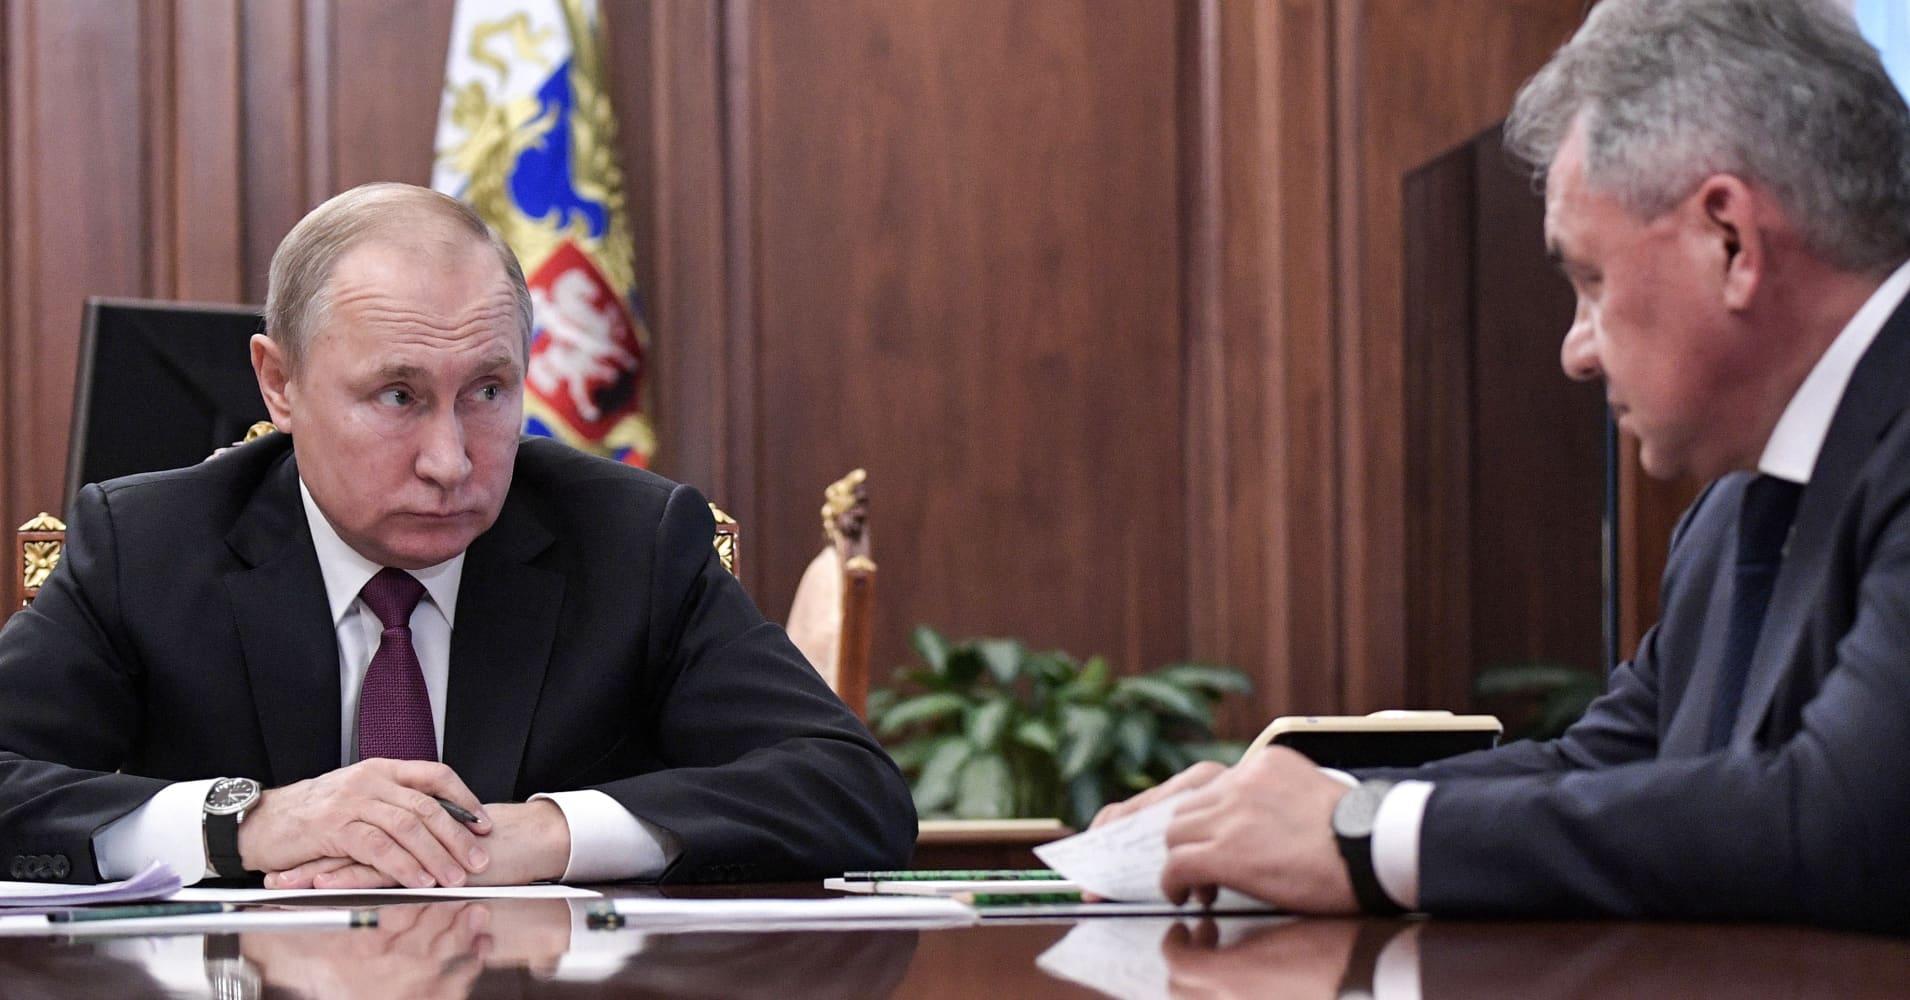 Putin signs decree suspending INF nuclear pact - Kremlin